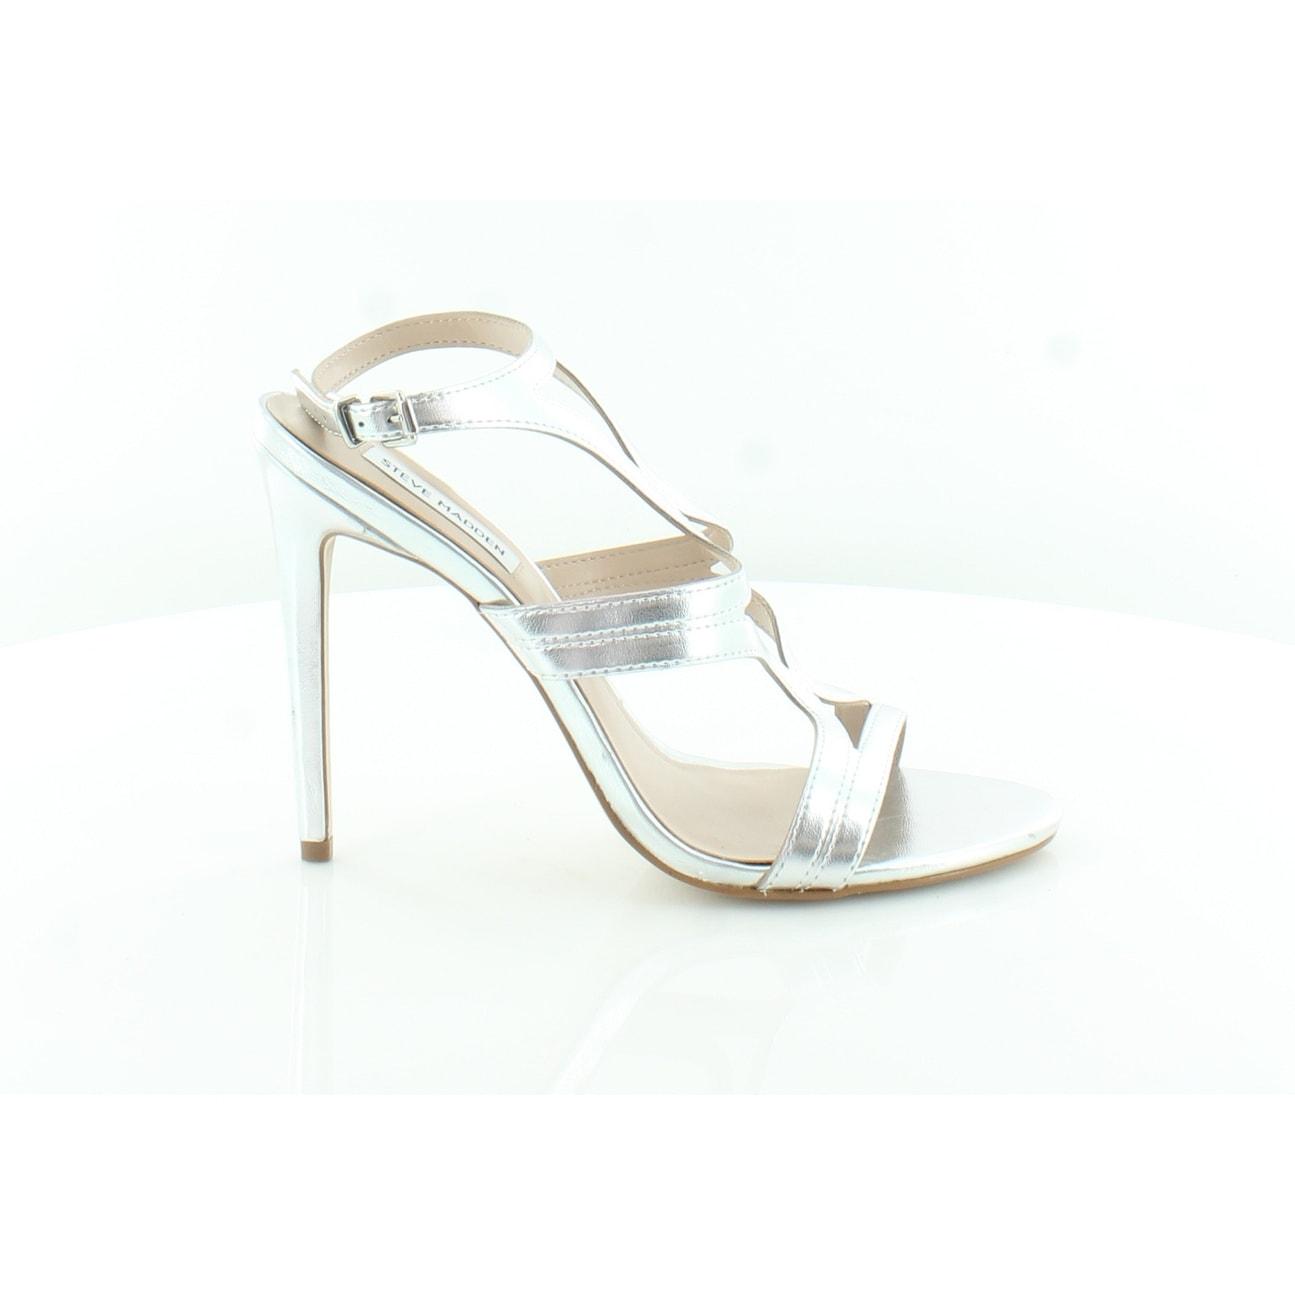 1cc8fc3cc4f Shop Steve Madden Sidney Women s Heels Silver - Free Shipping Today - -  27481142